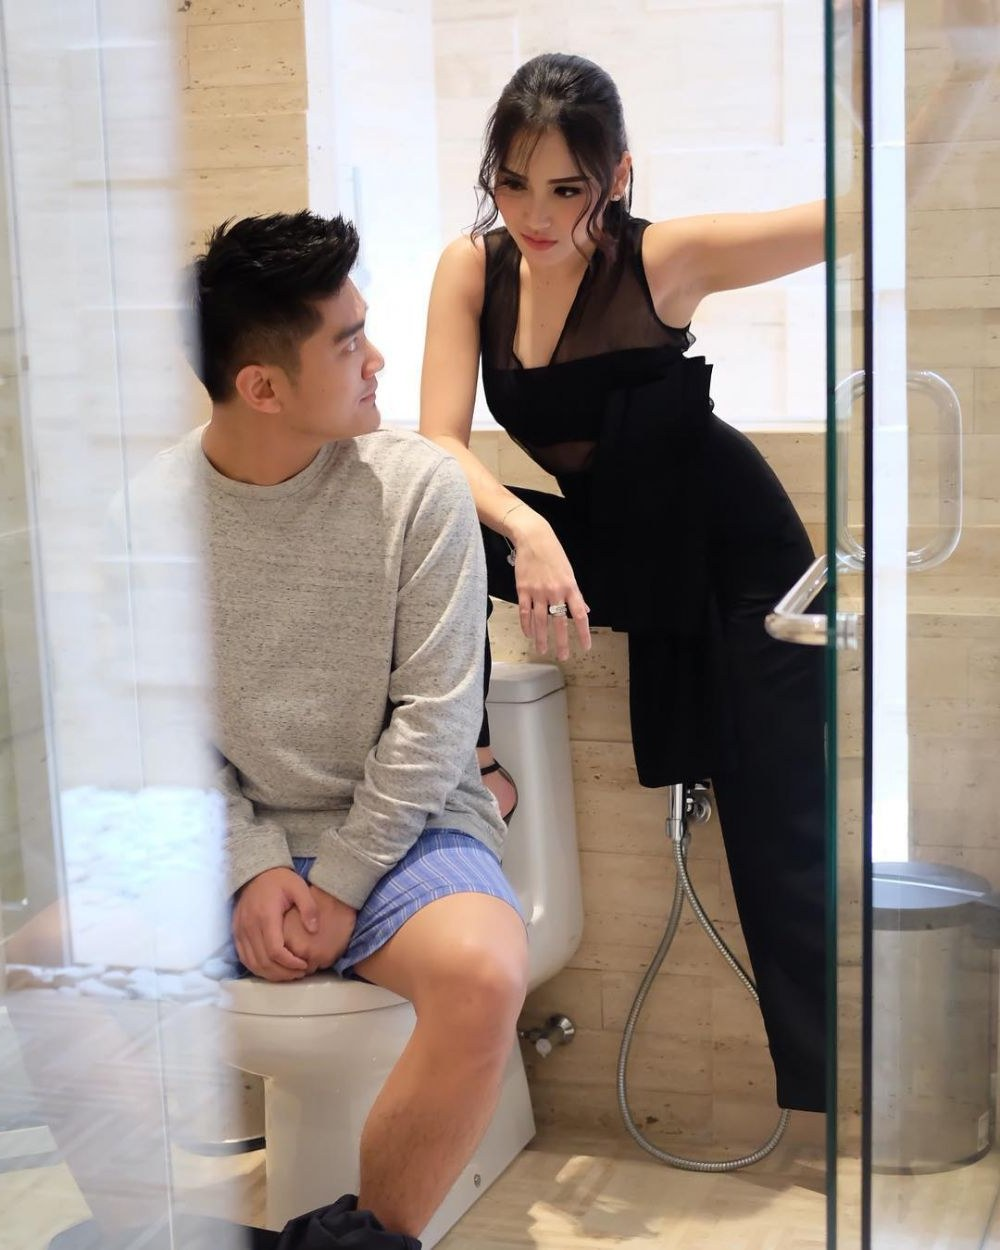 Inspirasi Baju Lebaran Ayu Ting Ting 2018 0gdr Ayu Ting Ting Satu toilet Sama Boy William Tatapan